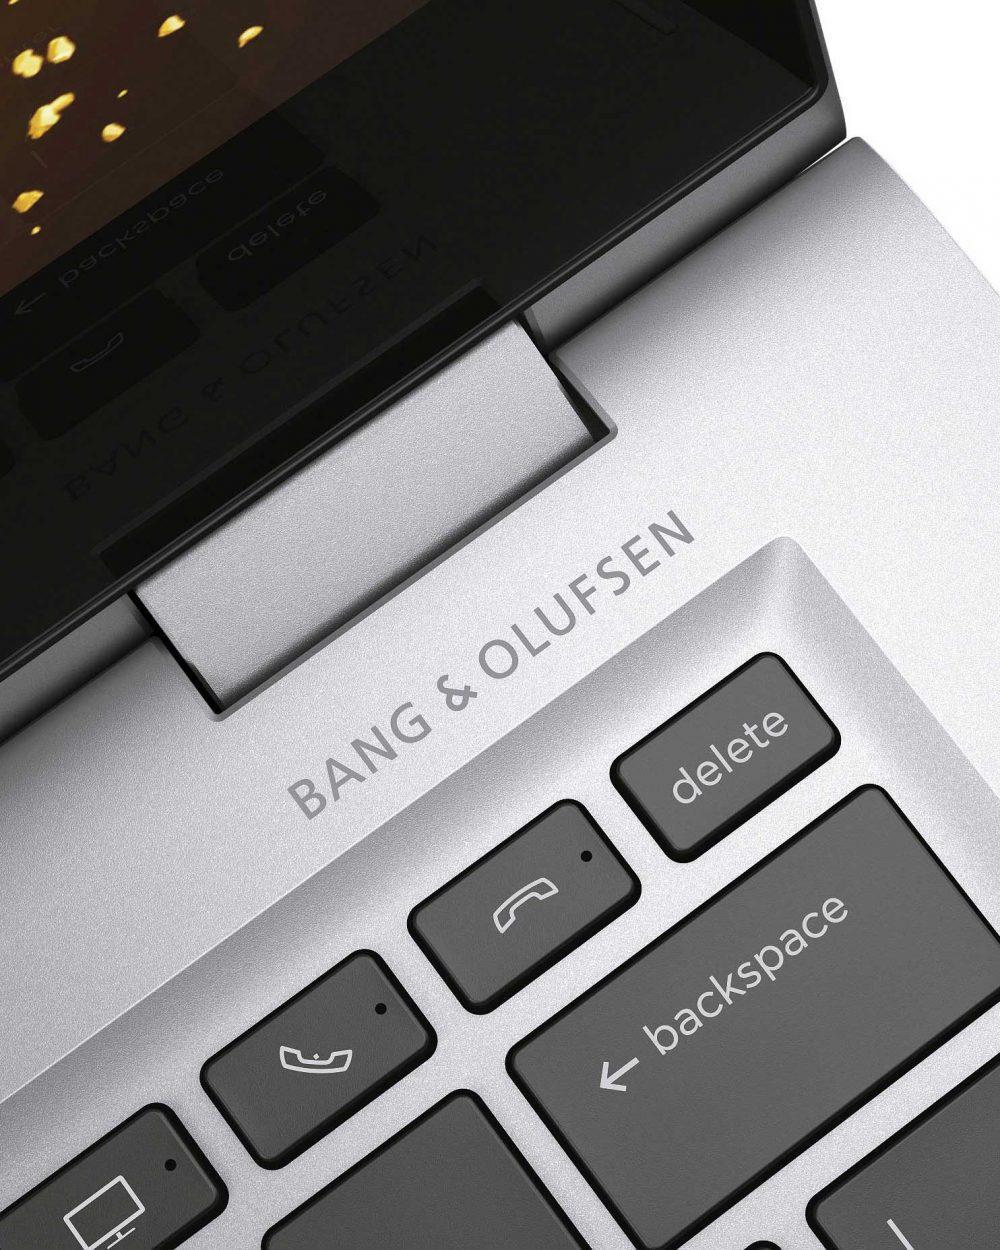 Bang and Olufsen laptop